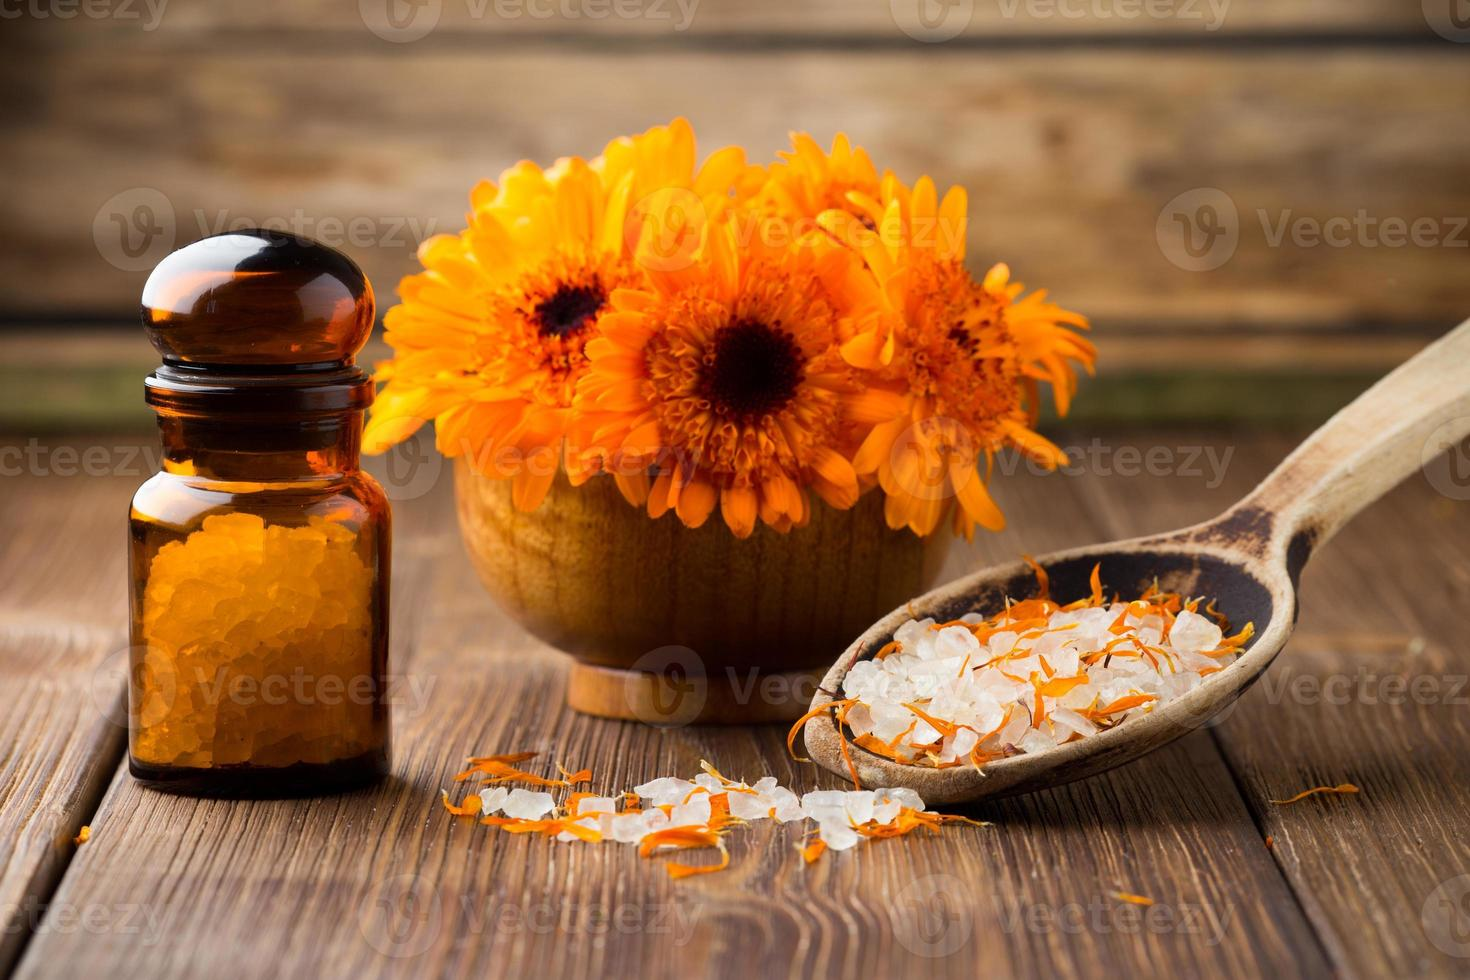 homeopatisk kalendula. foto